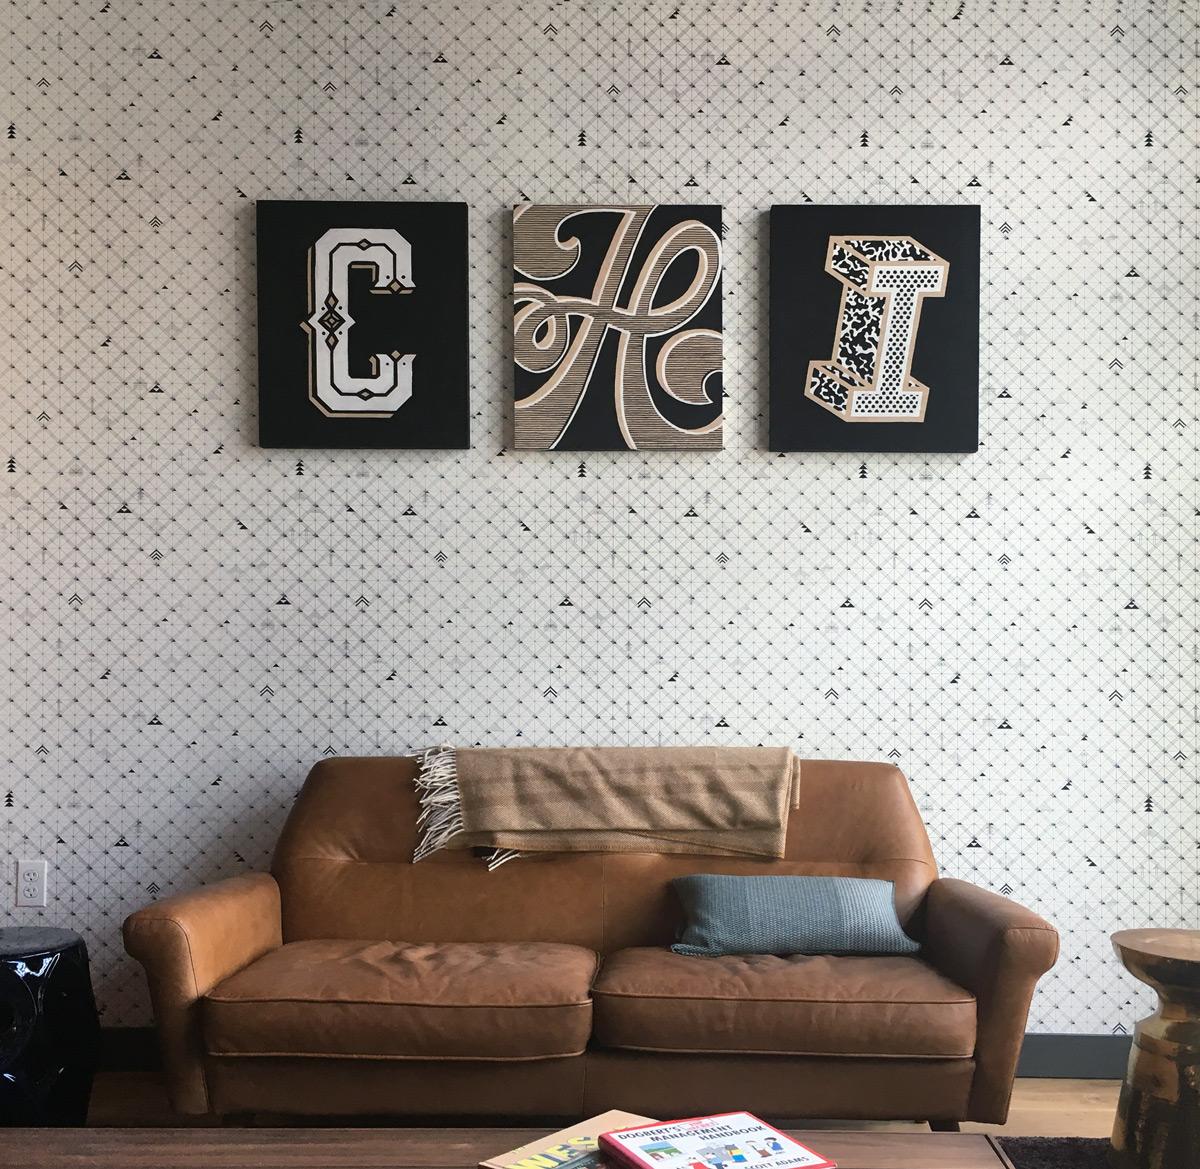 CHI-wall.jpg